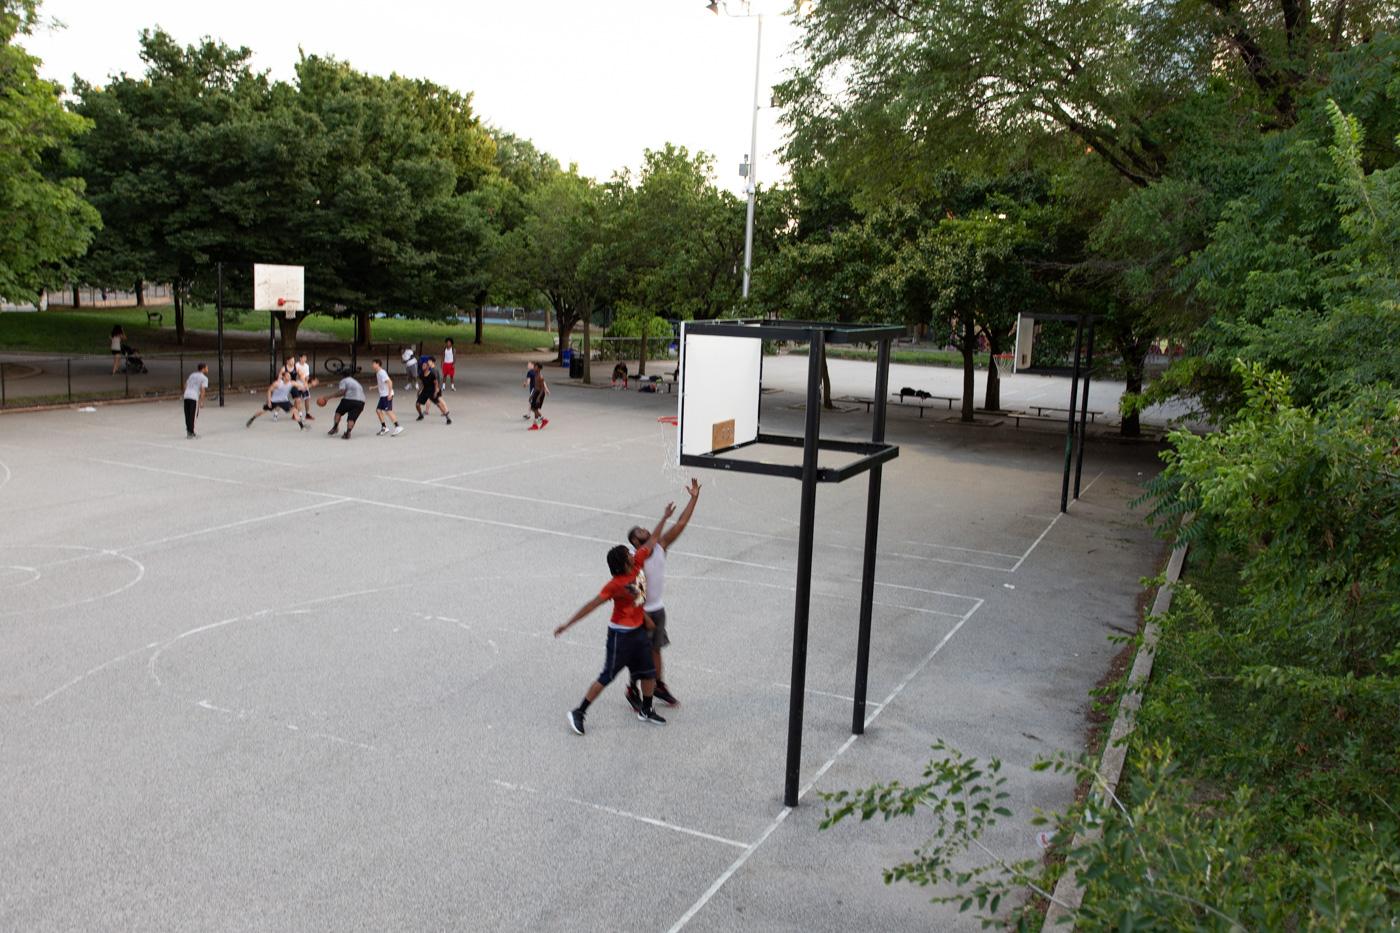 Basketball at Schuylkill River Park